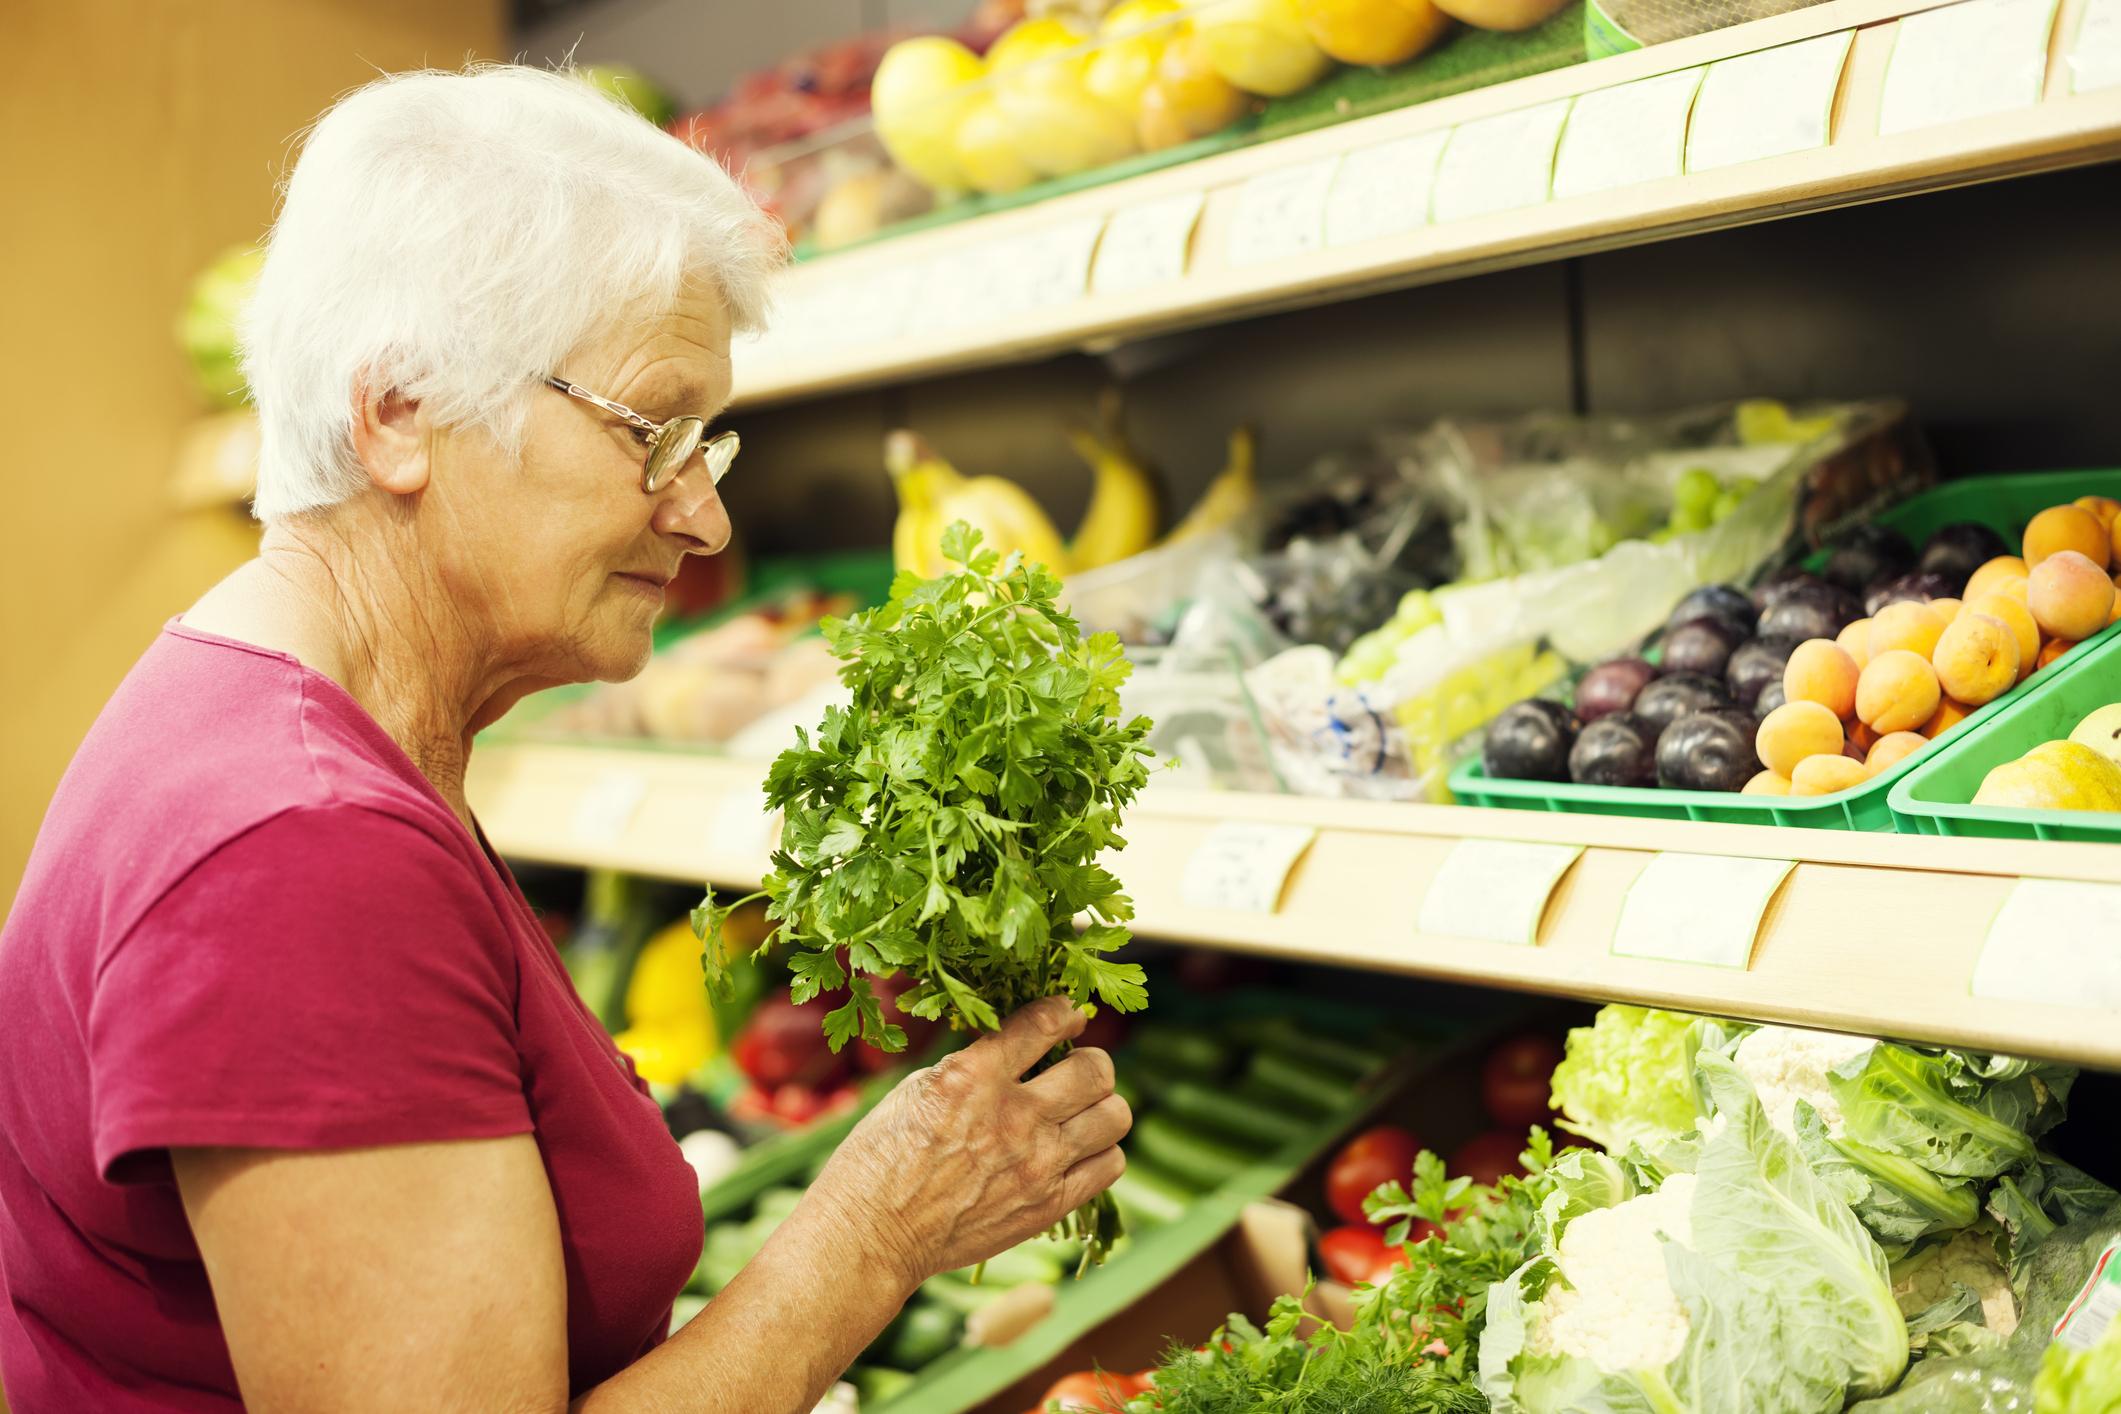 Senior woman buying produce at supermarket